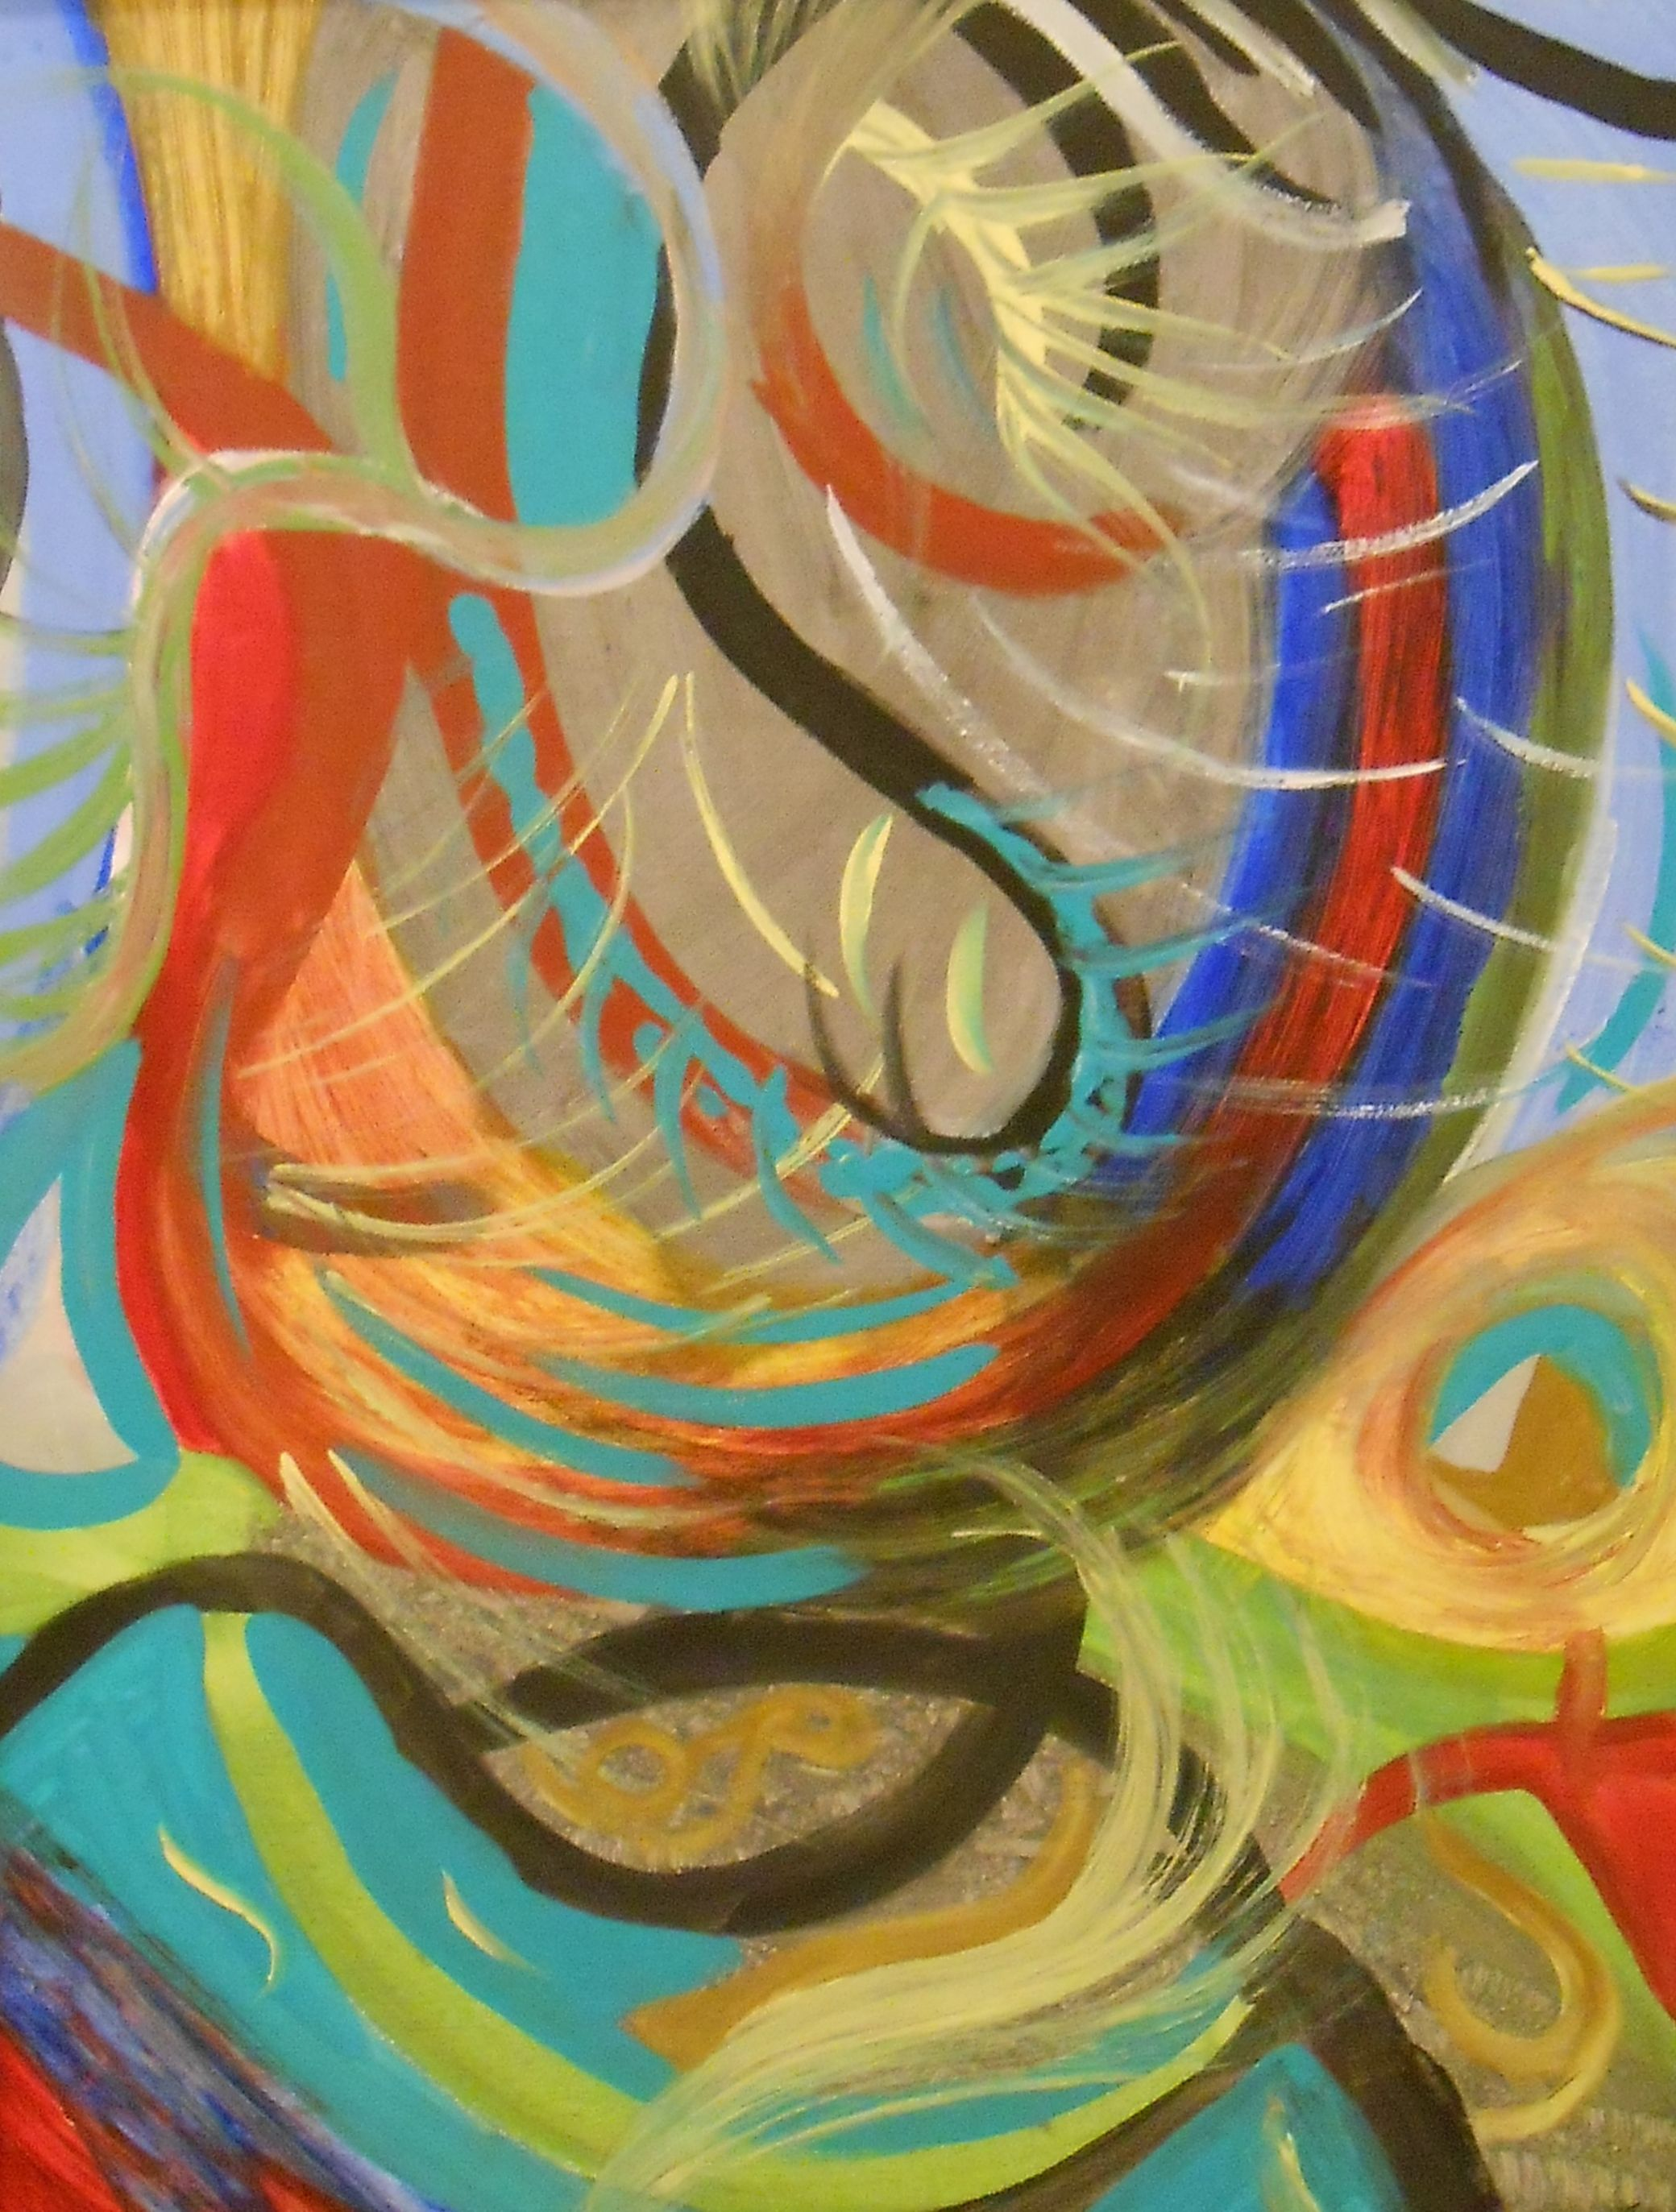 Abstract Art by Julie Crisan.  www.artbyjuliec.com.